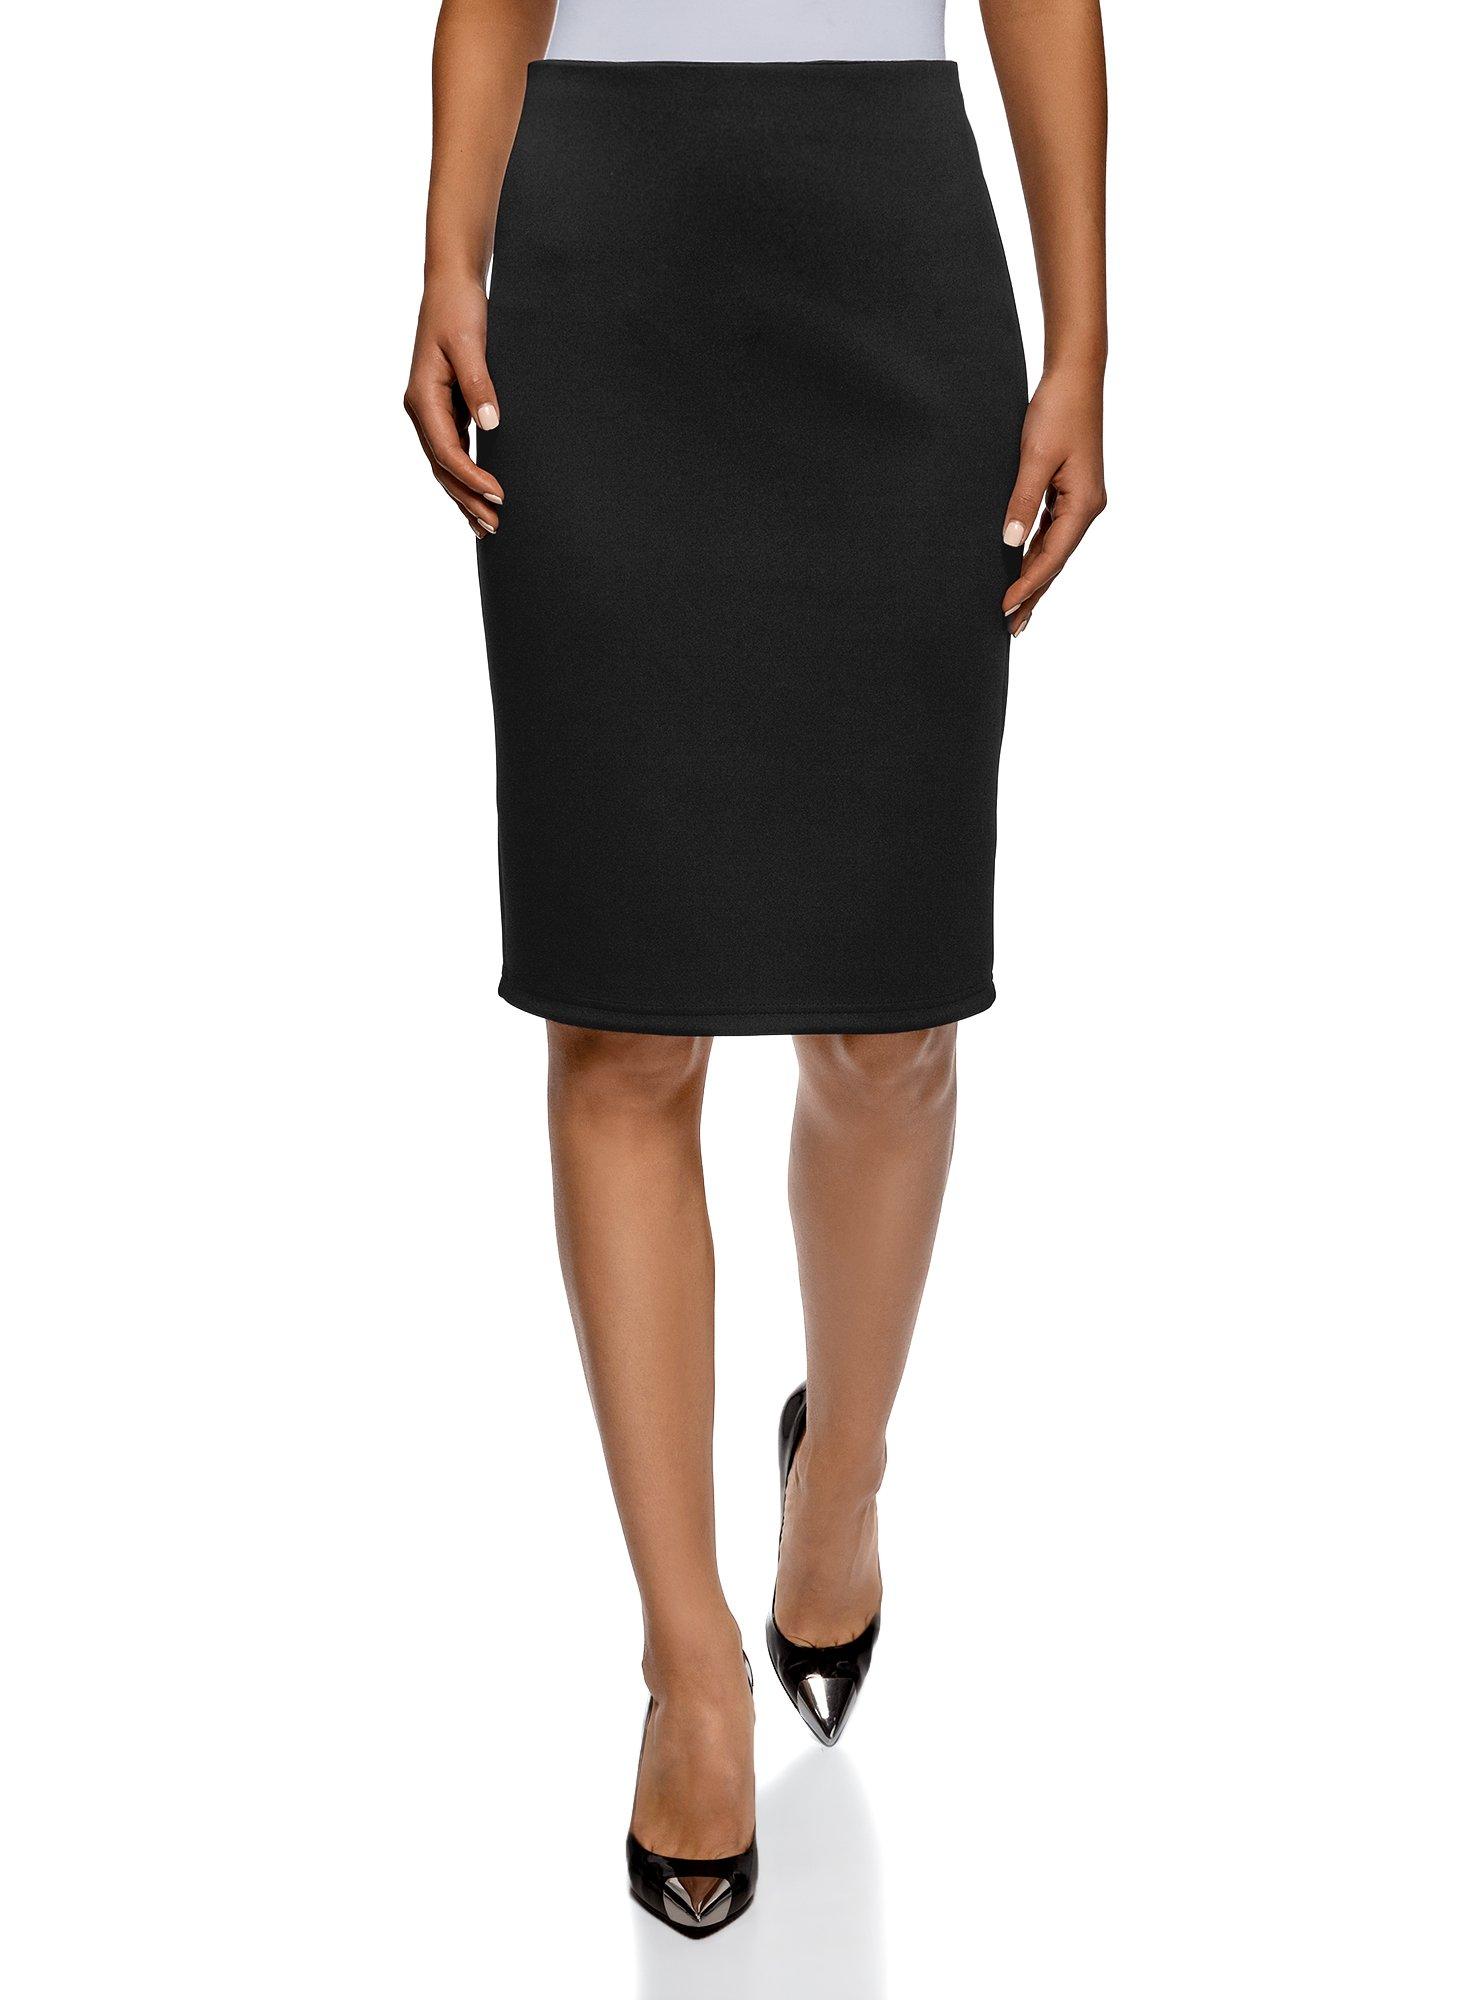 oodji Collection Women's Jersey Pencil Skirt, Black, 6